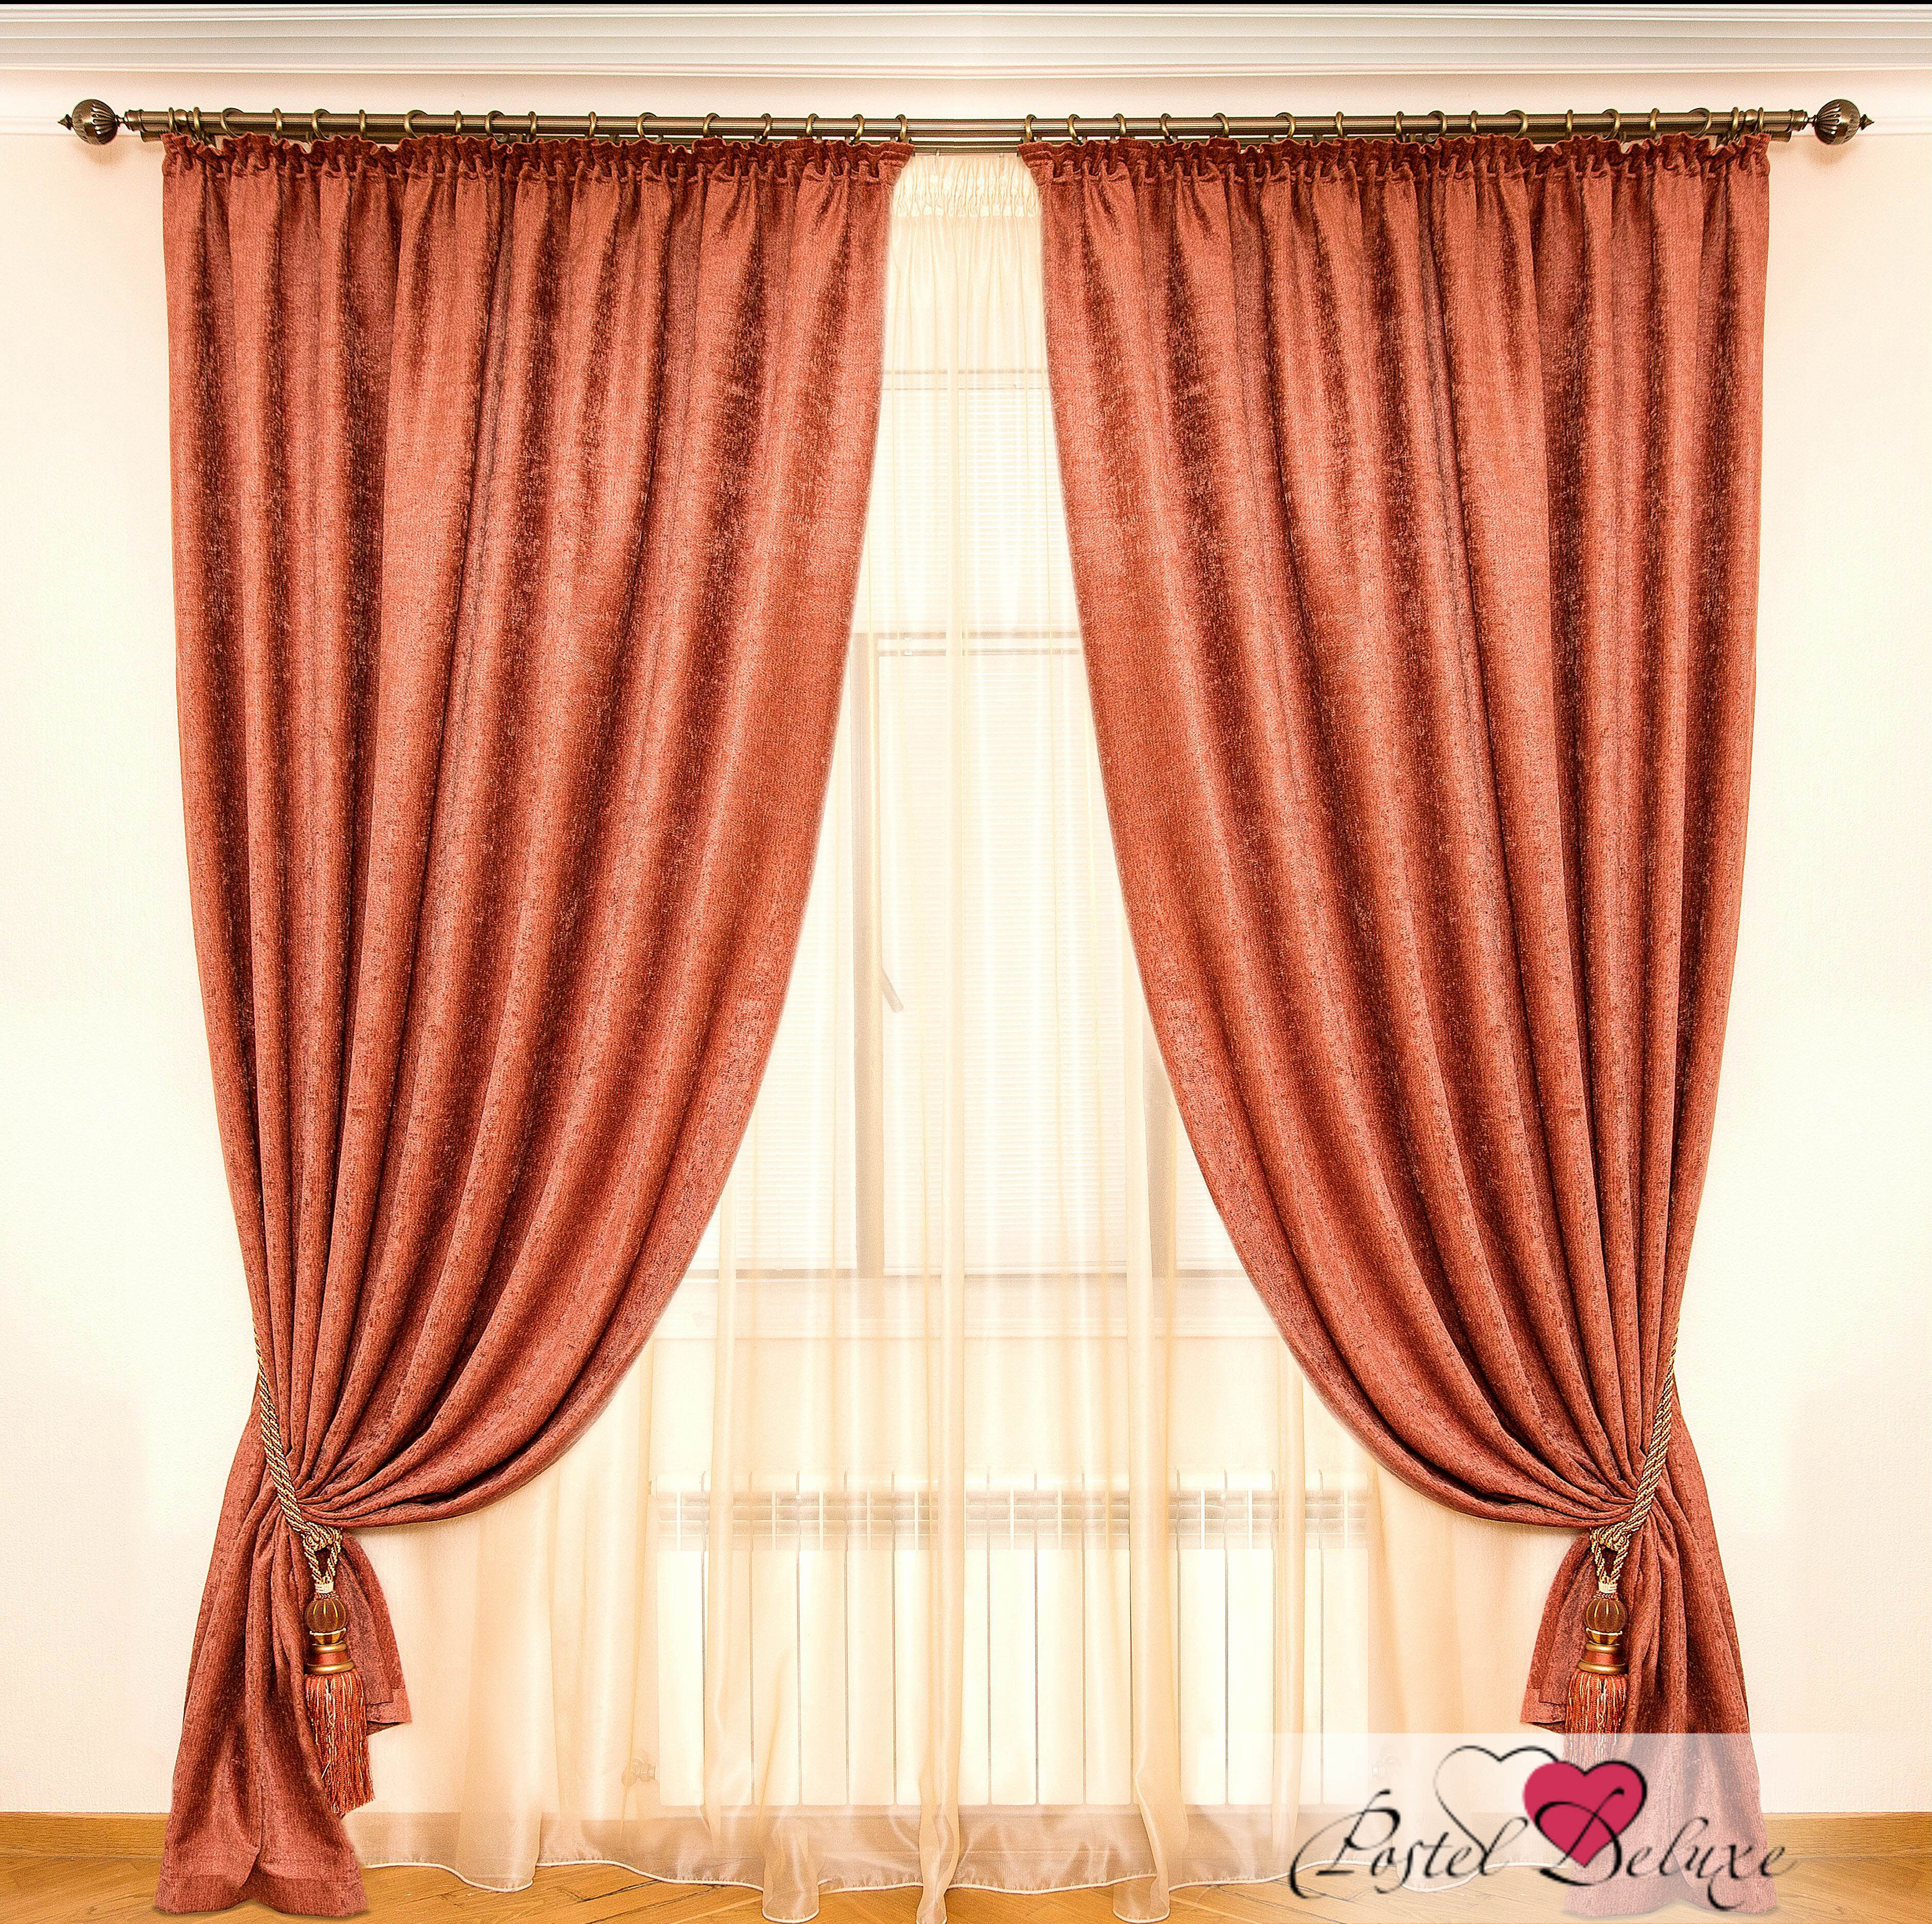 Шторы Interiotex Классические шторы Хельга Цвет: Терракотовый шторы kauffort классические шторы barolo